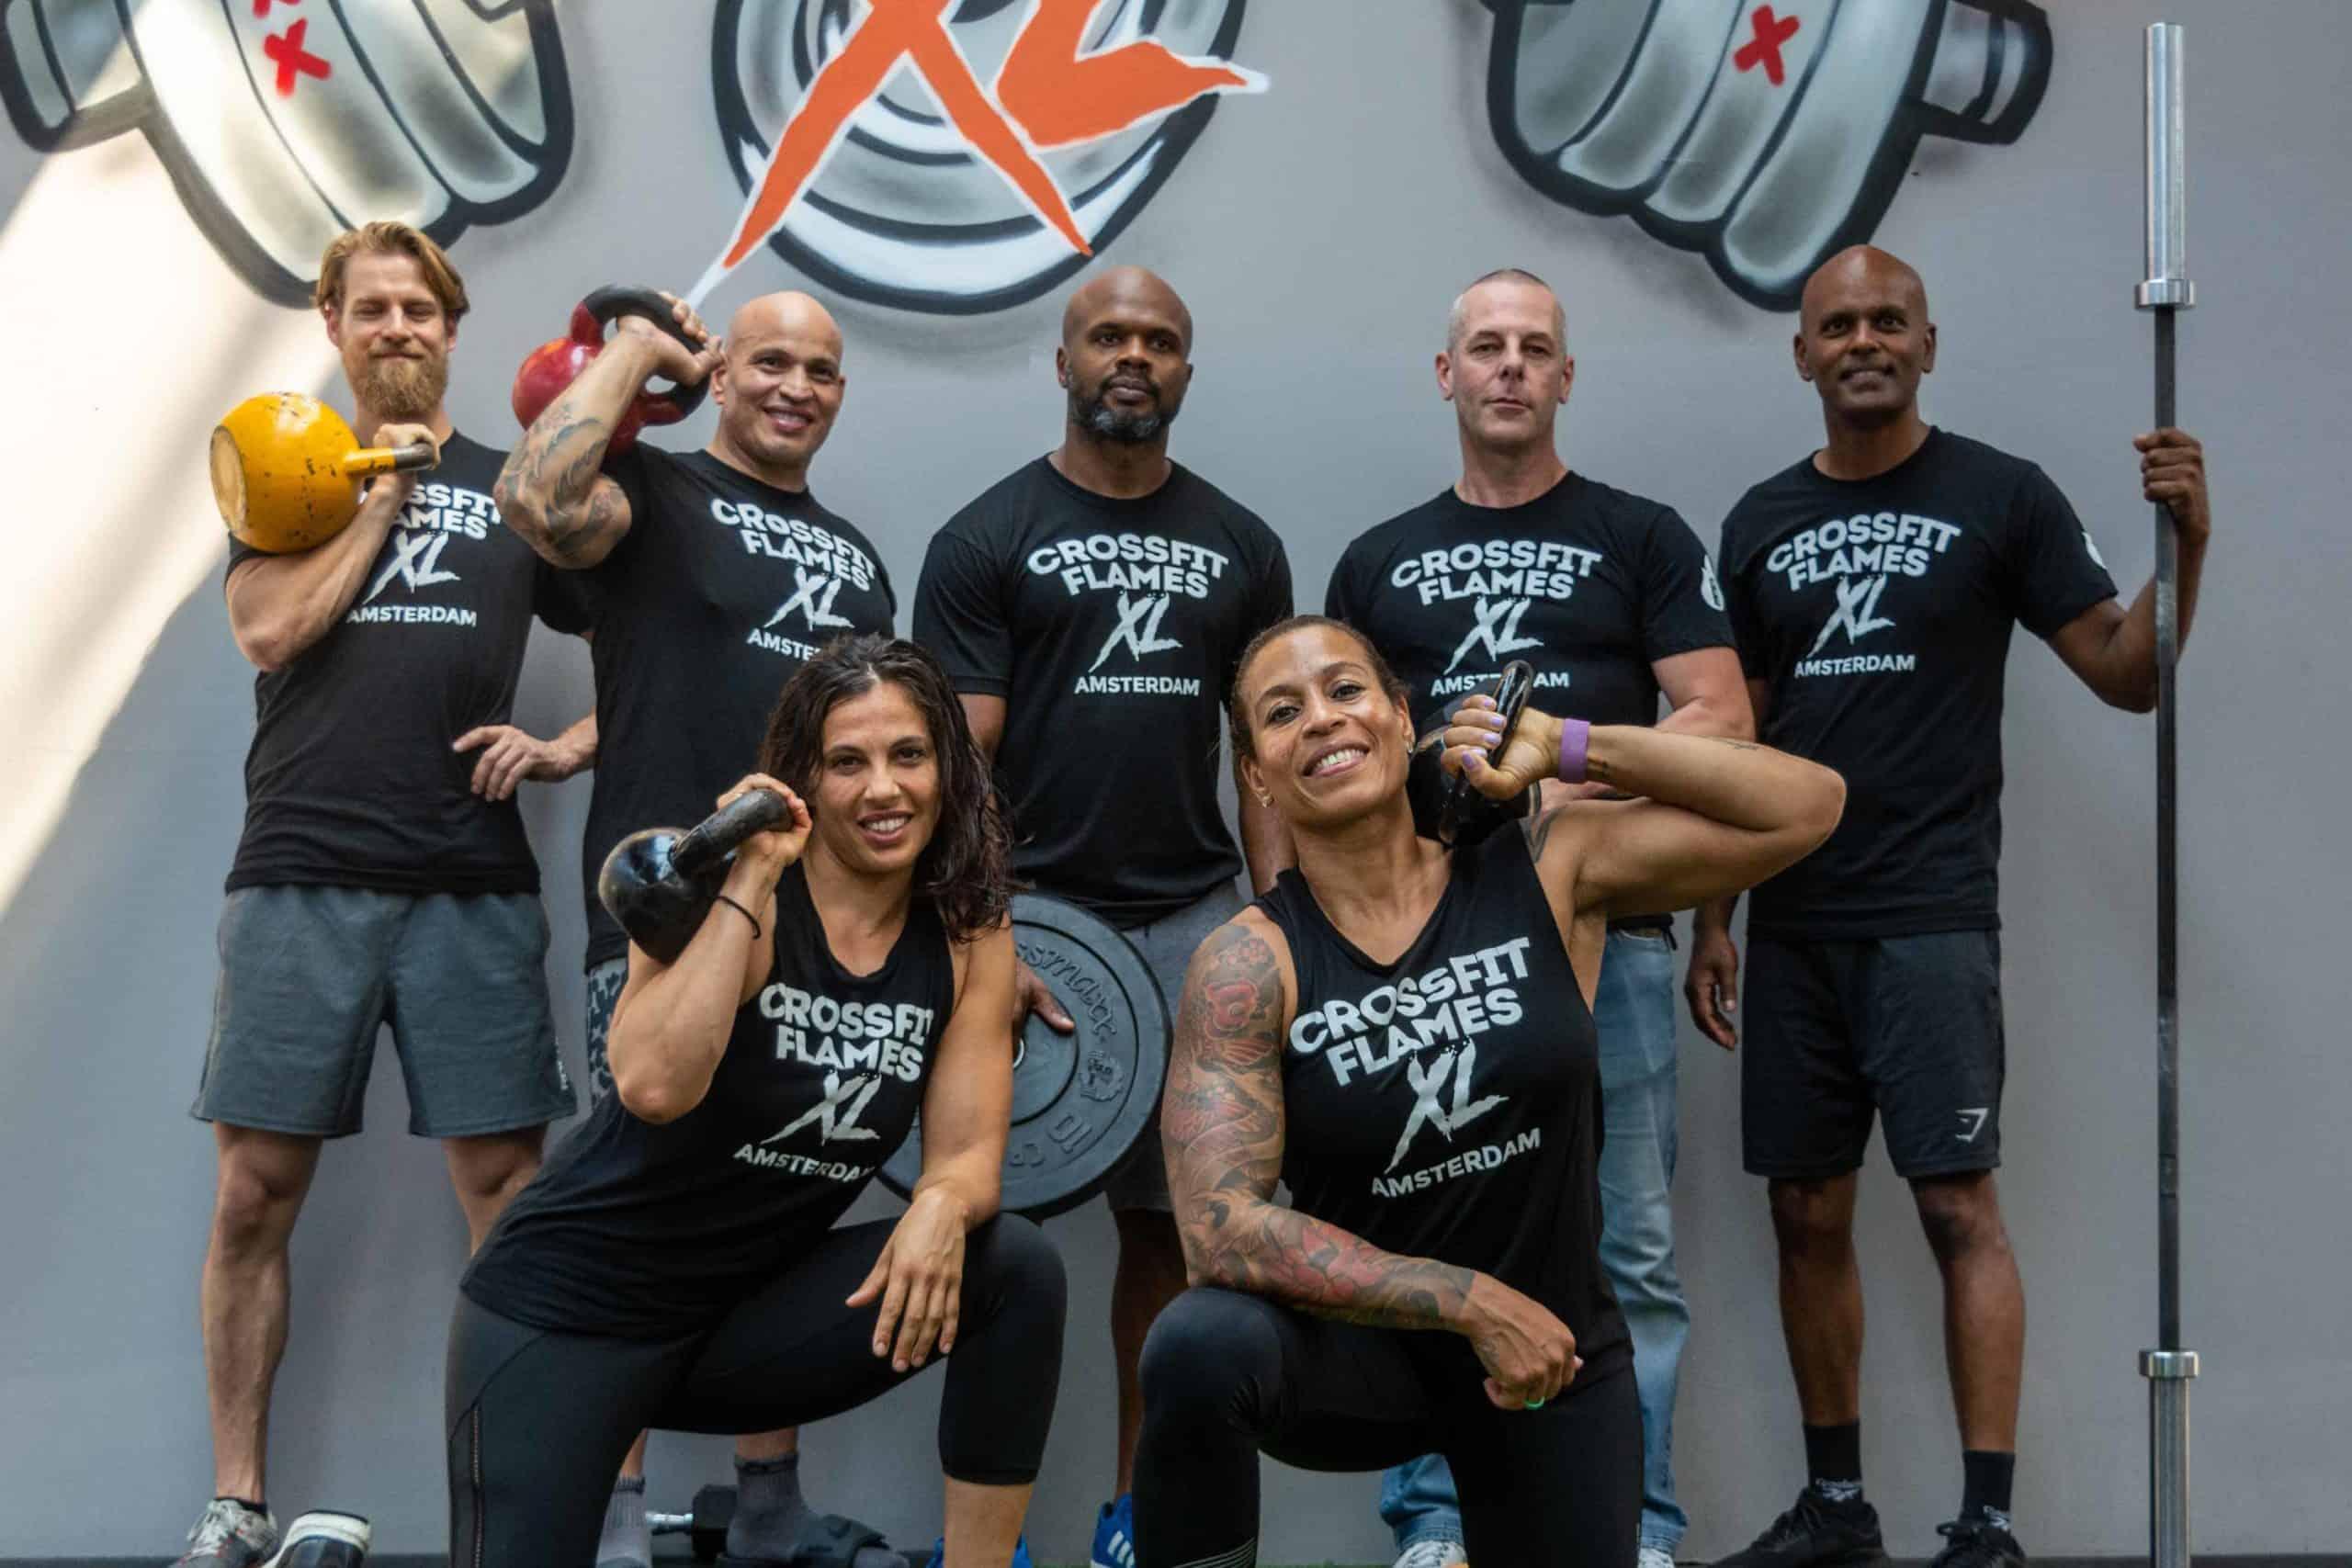 Prachtige CrossFit Flames XL T-shirts